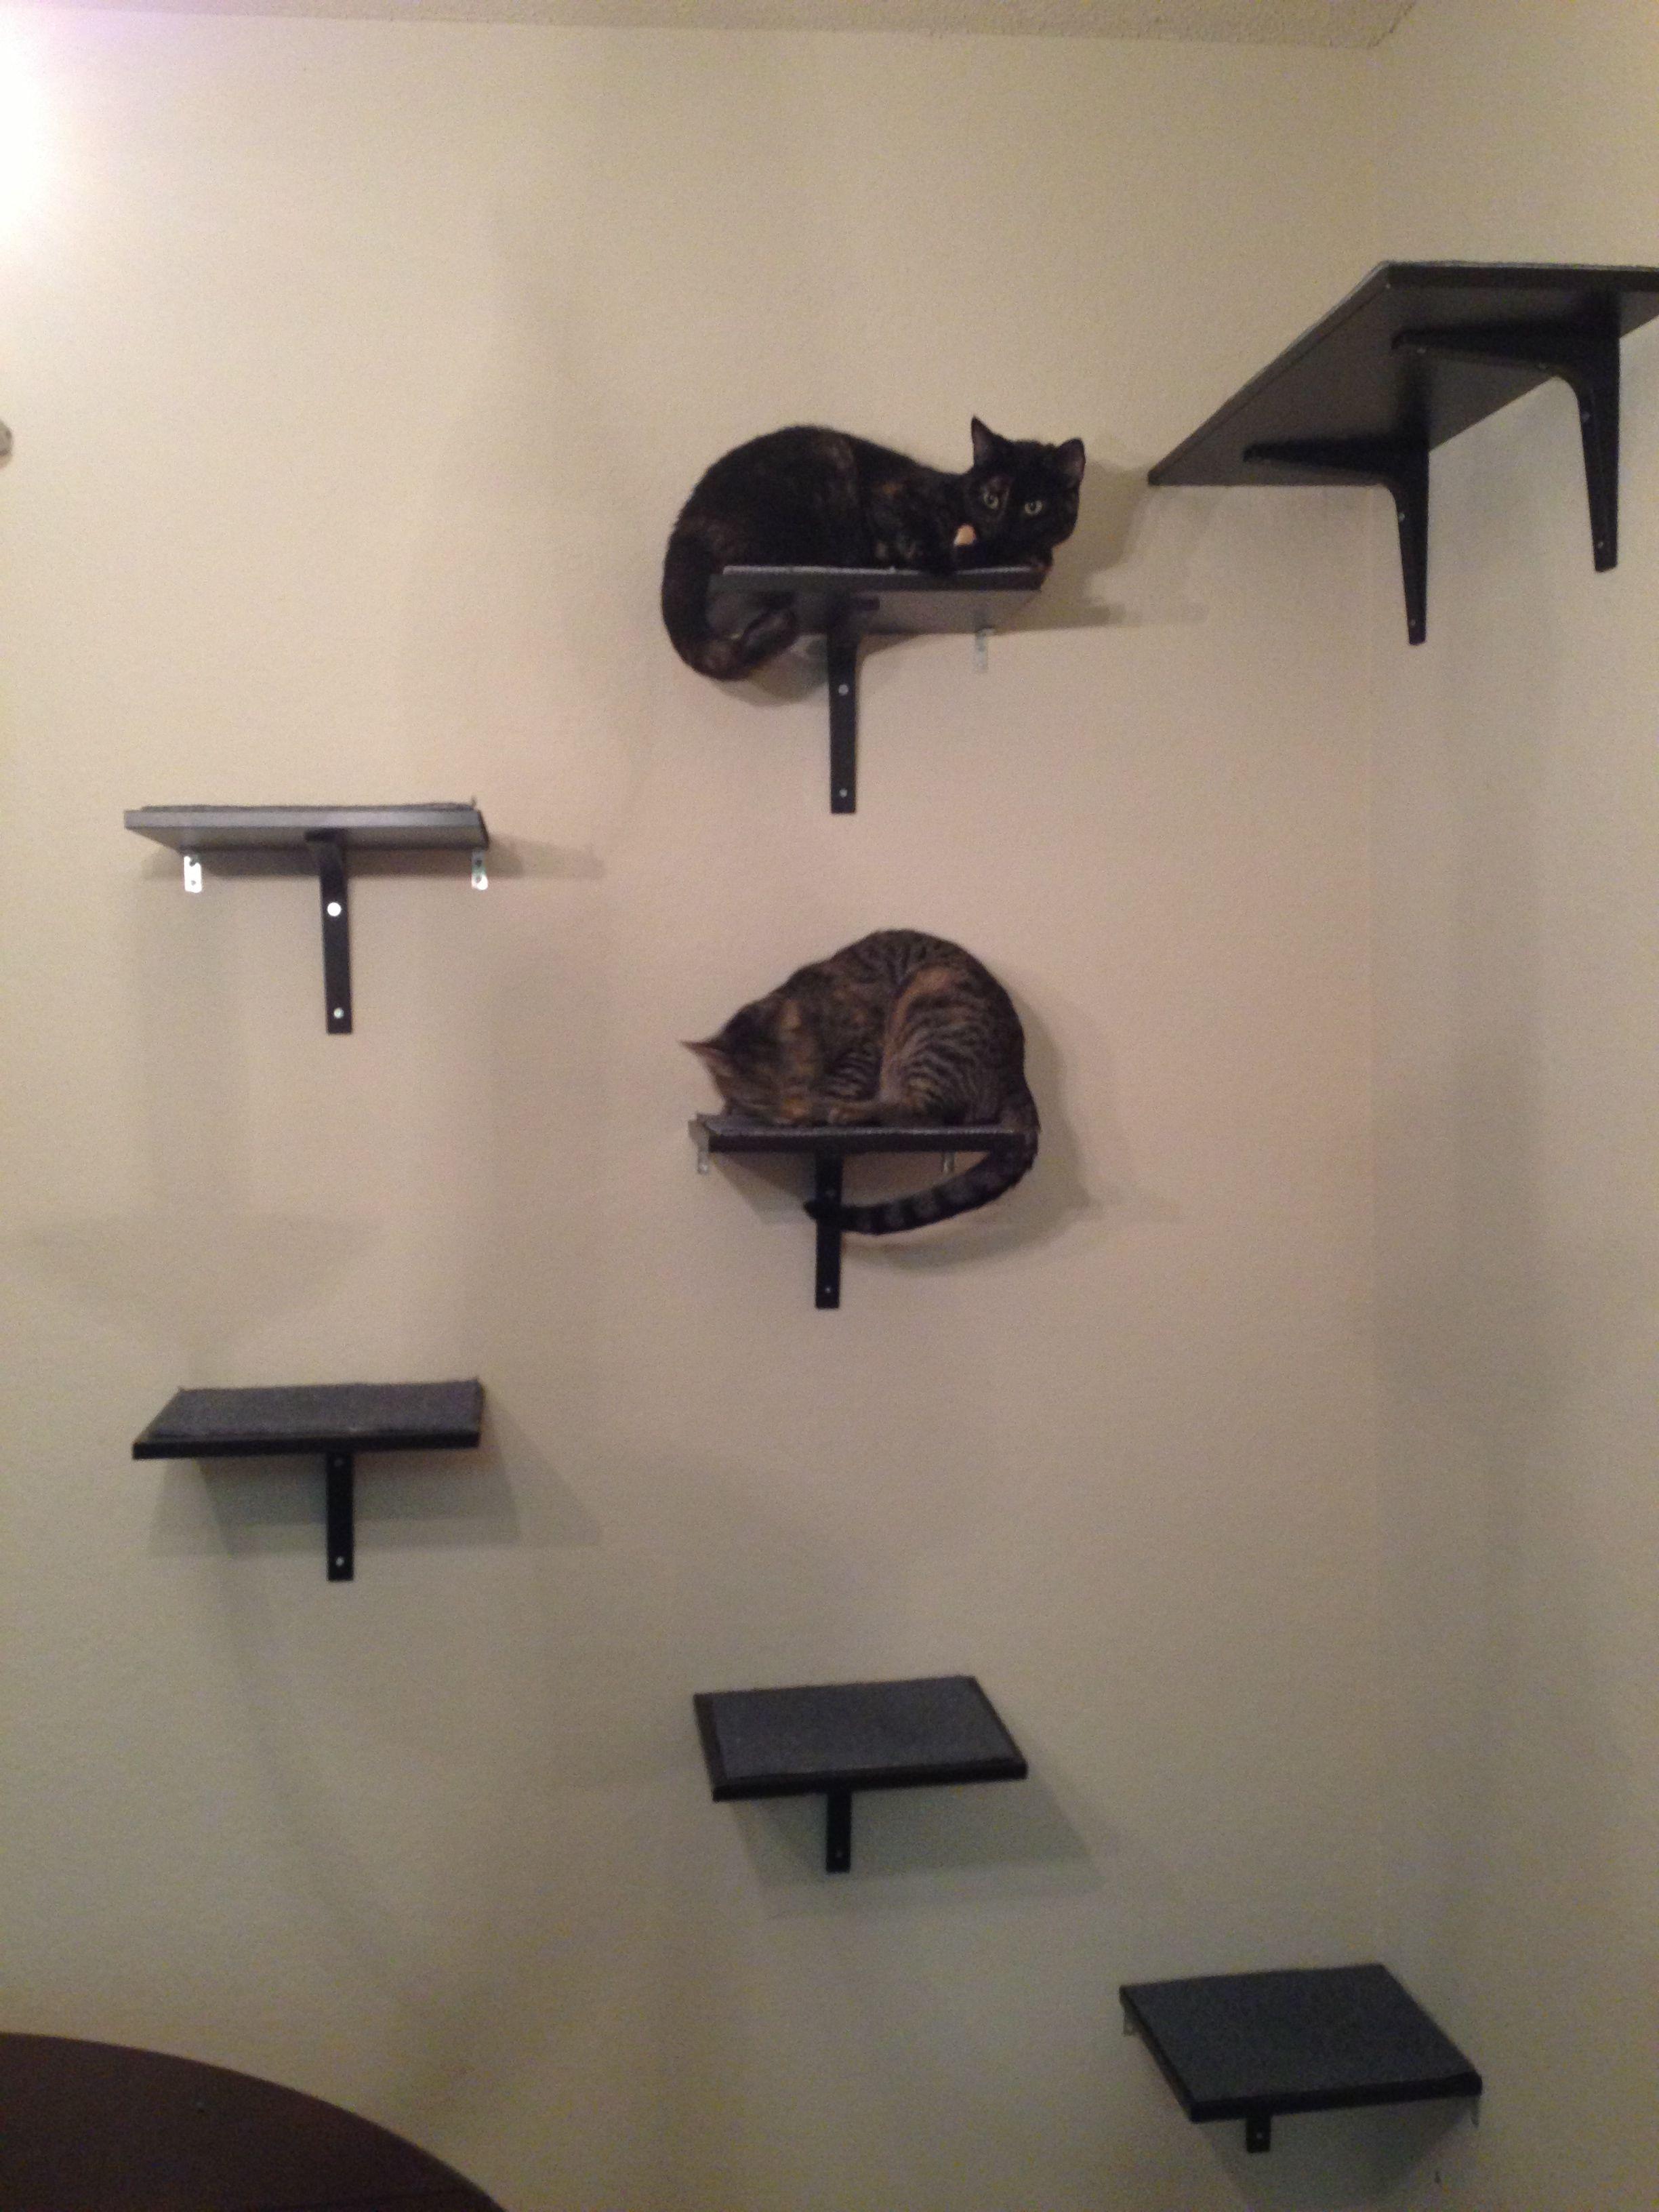 ikea hack cat shelves cats pinterest einrichtung natur und deko. Black Bedroom Furniture Sets. Home Design Ideas